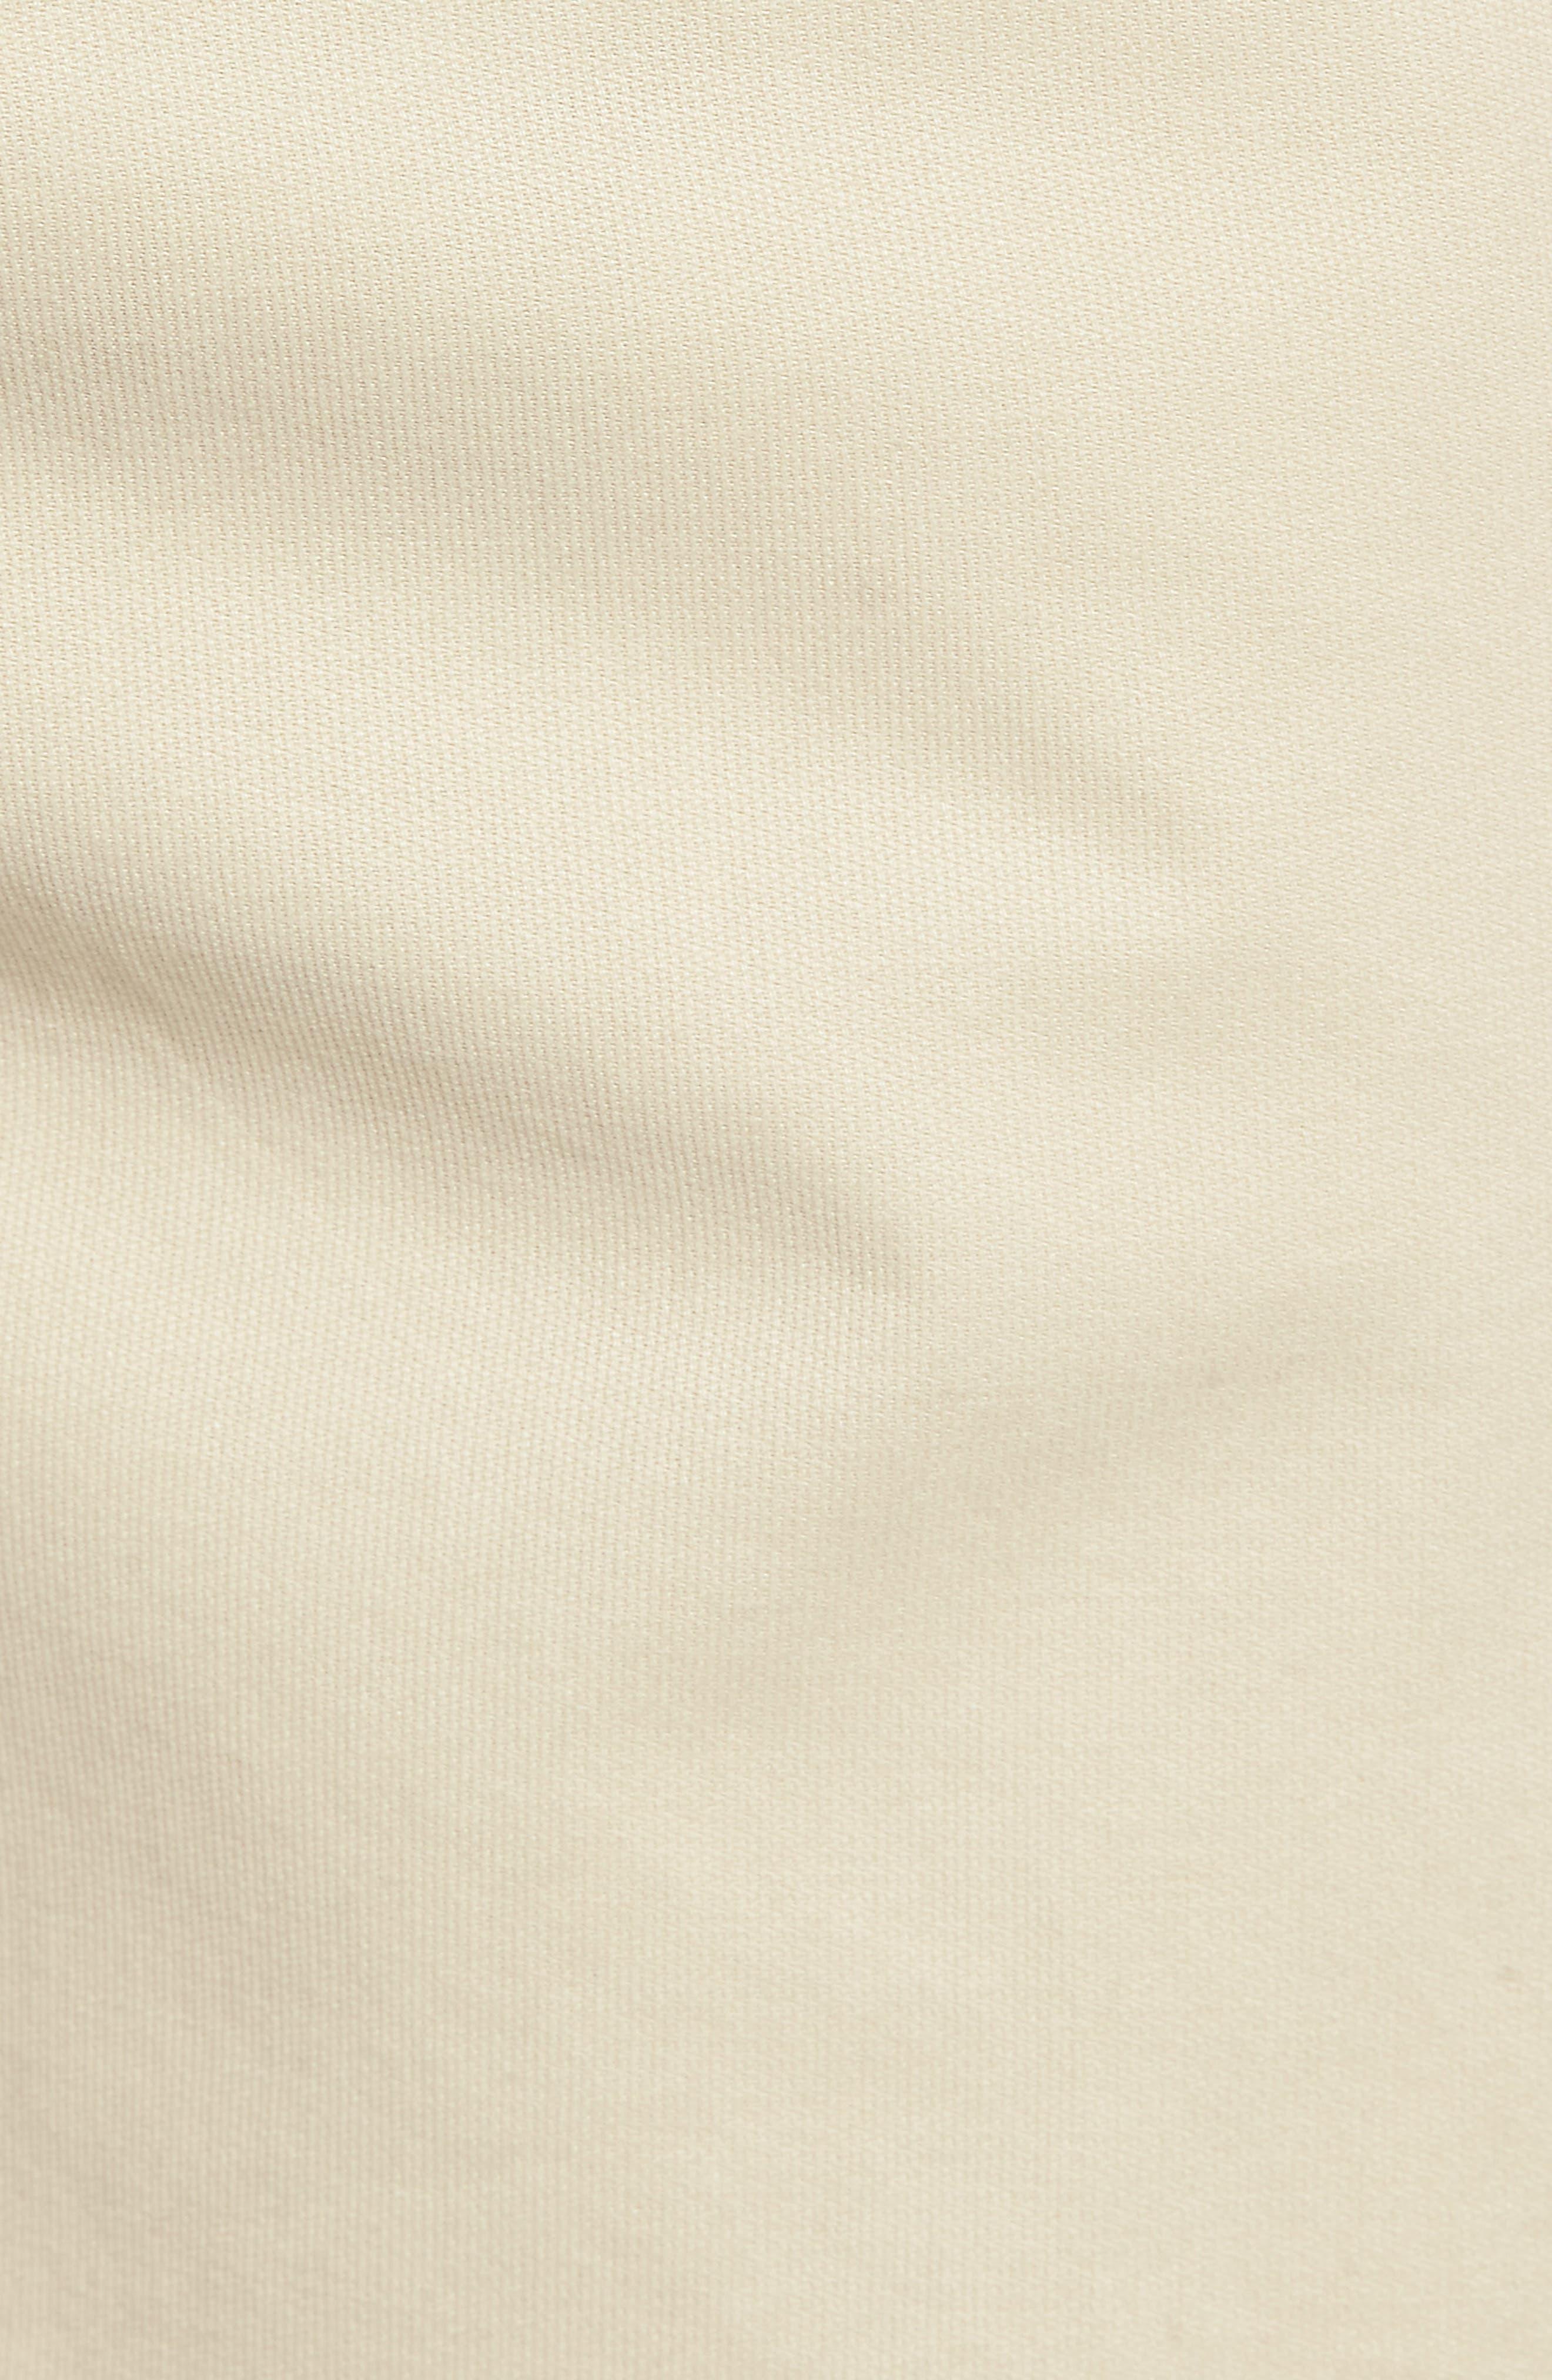 Drawstring Bedford Corduroy Shorts,                             Alternate thumbnail 14, color,